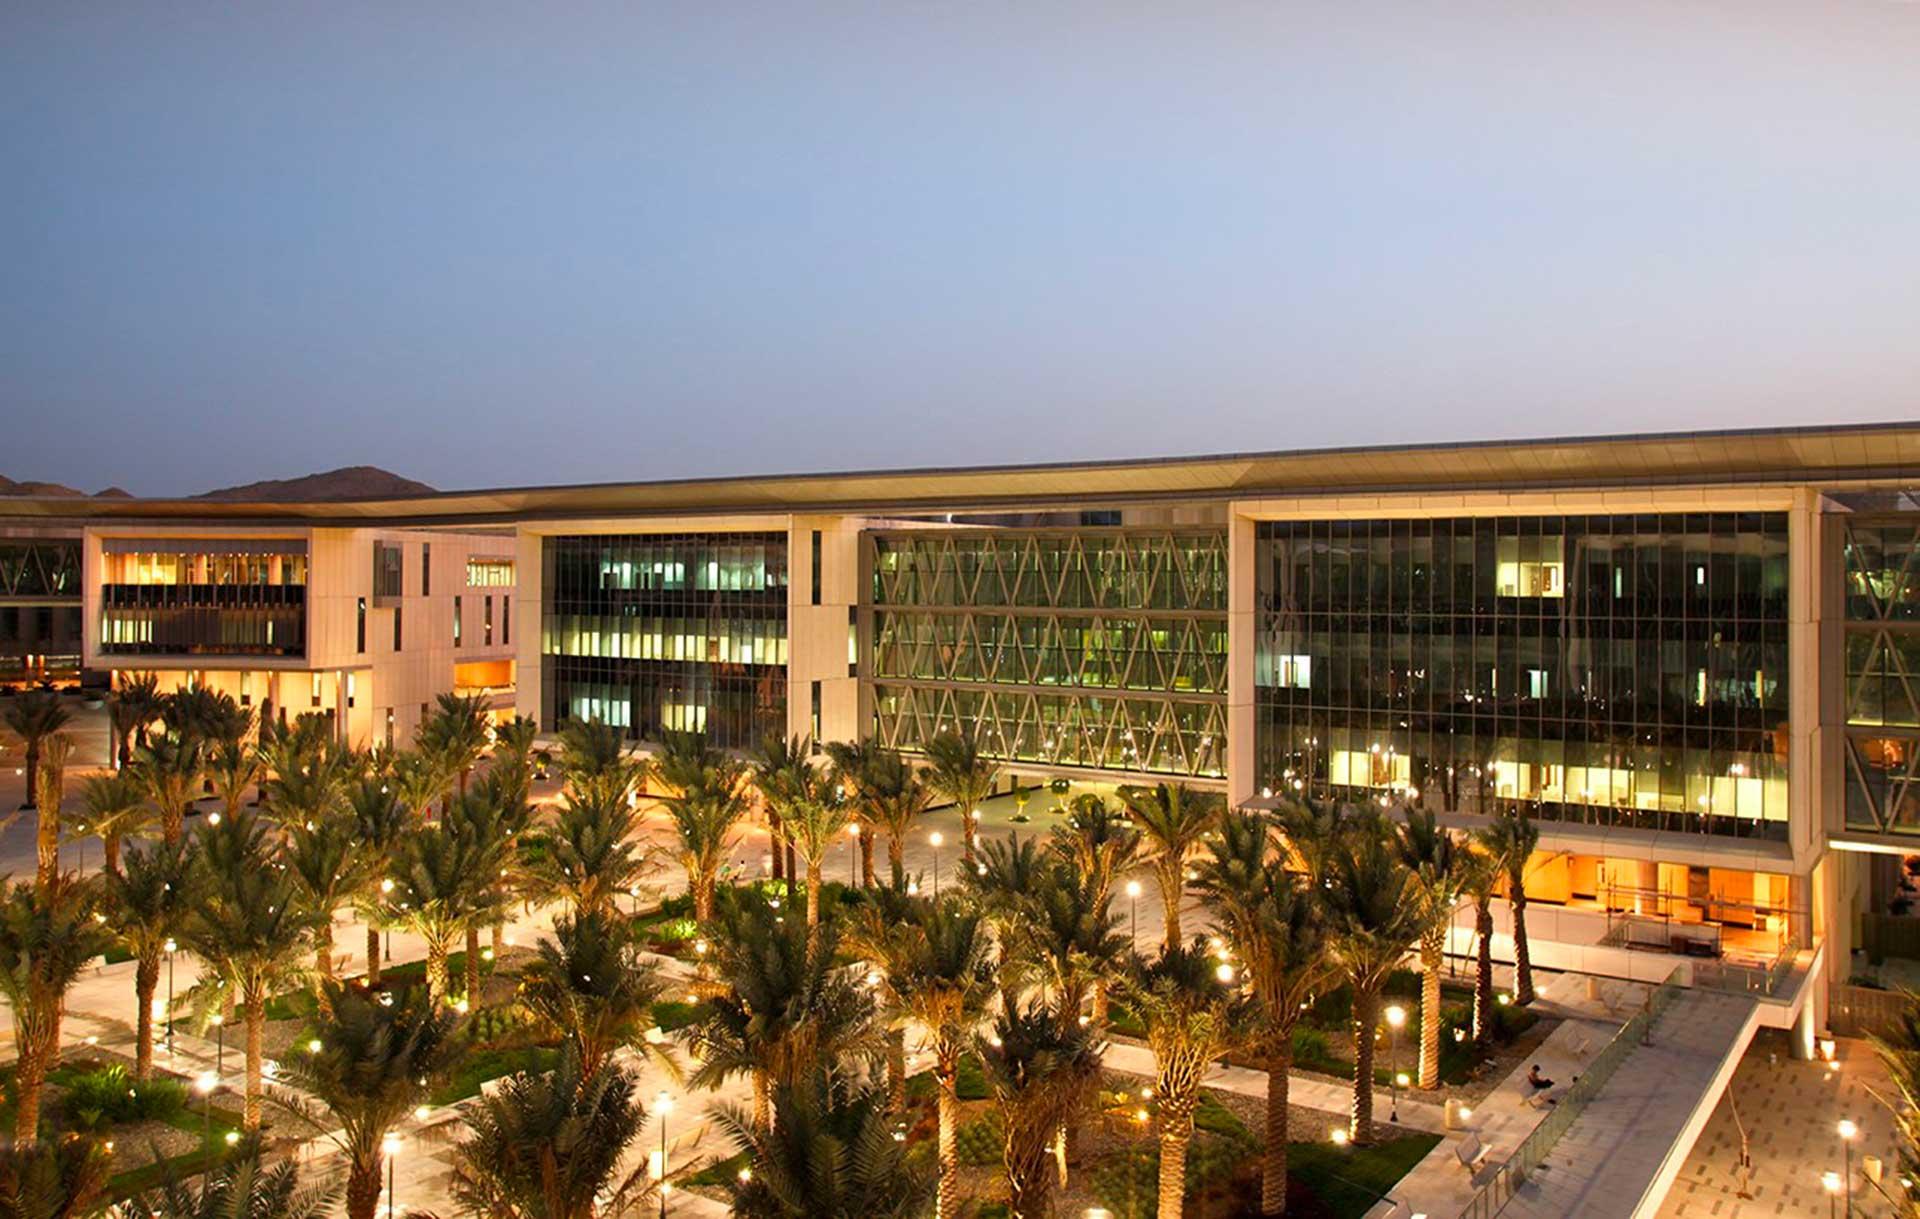 King Saud Bin Abdulaziz University Riyadh 2